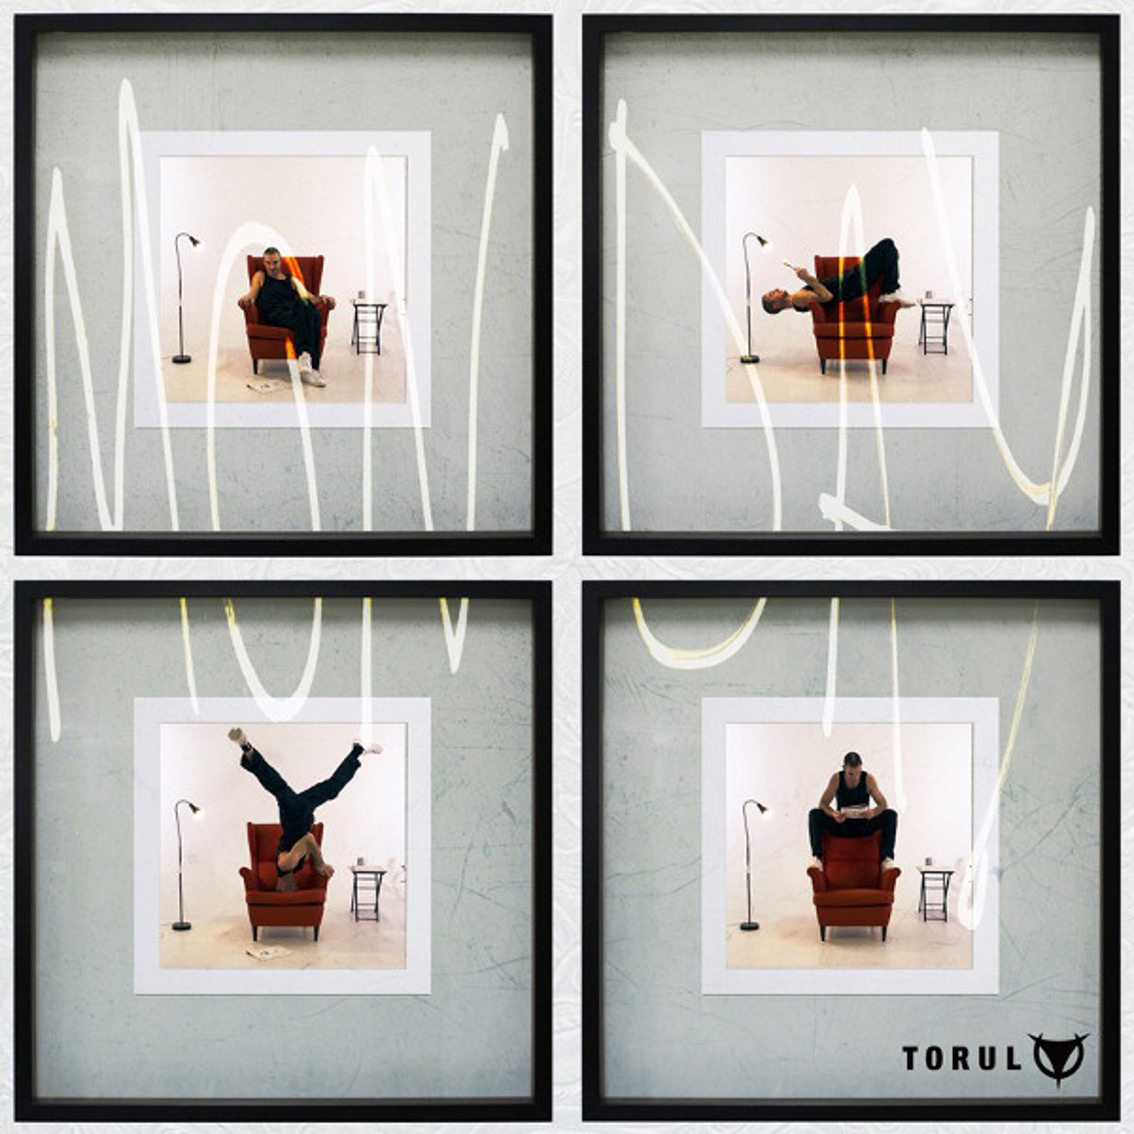 Torul cover Depeche Mode on new maxi-single 'Monday'